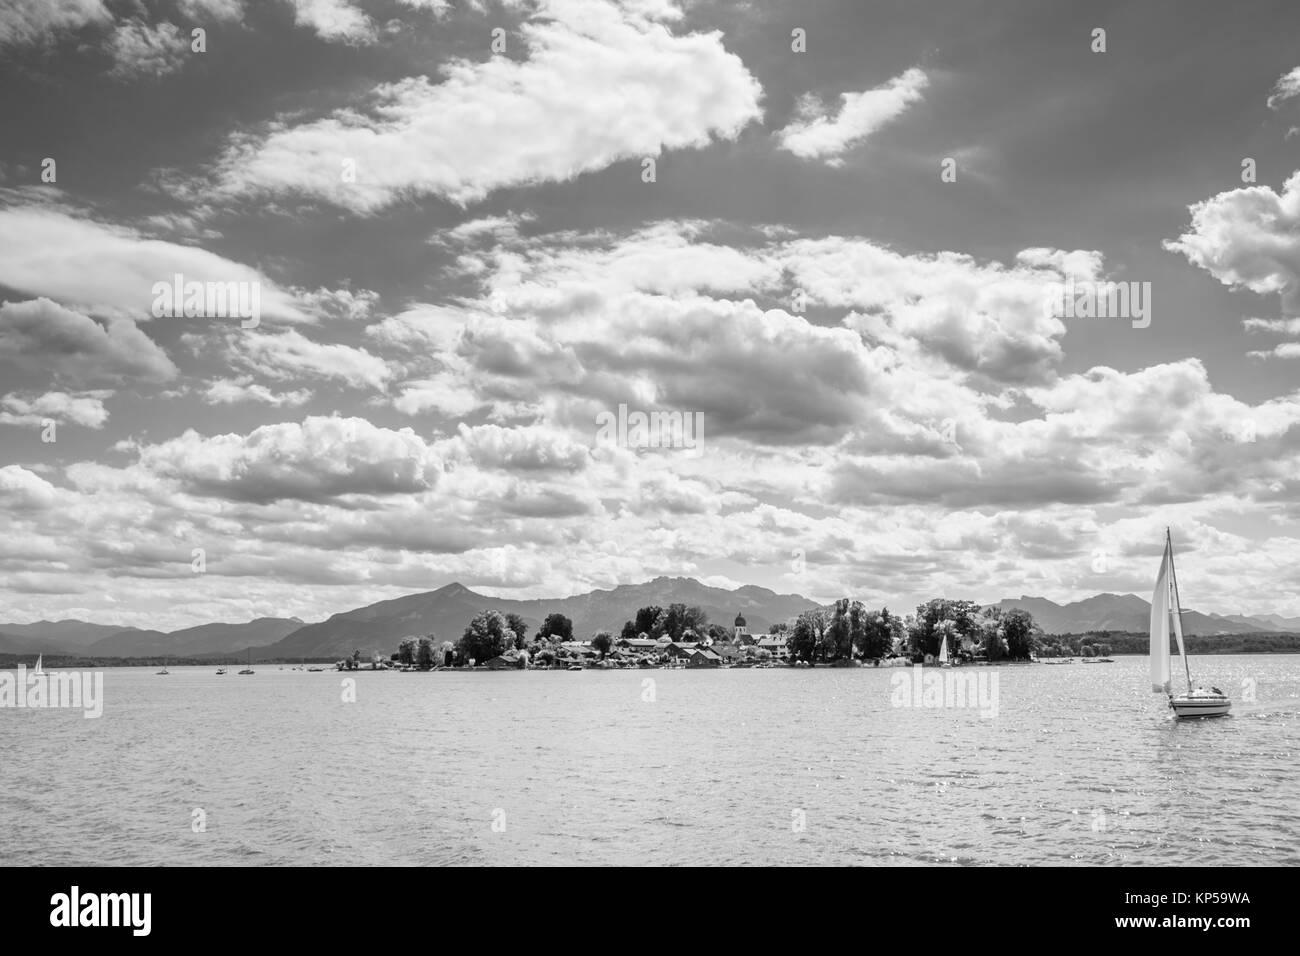 frauenchiemsee island,chiemgau,bayern,germany - Stock Image